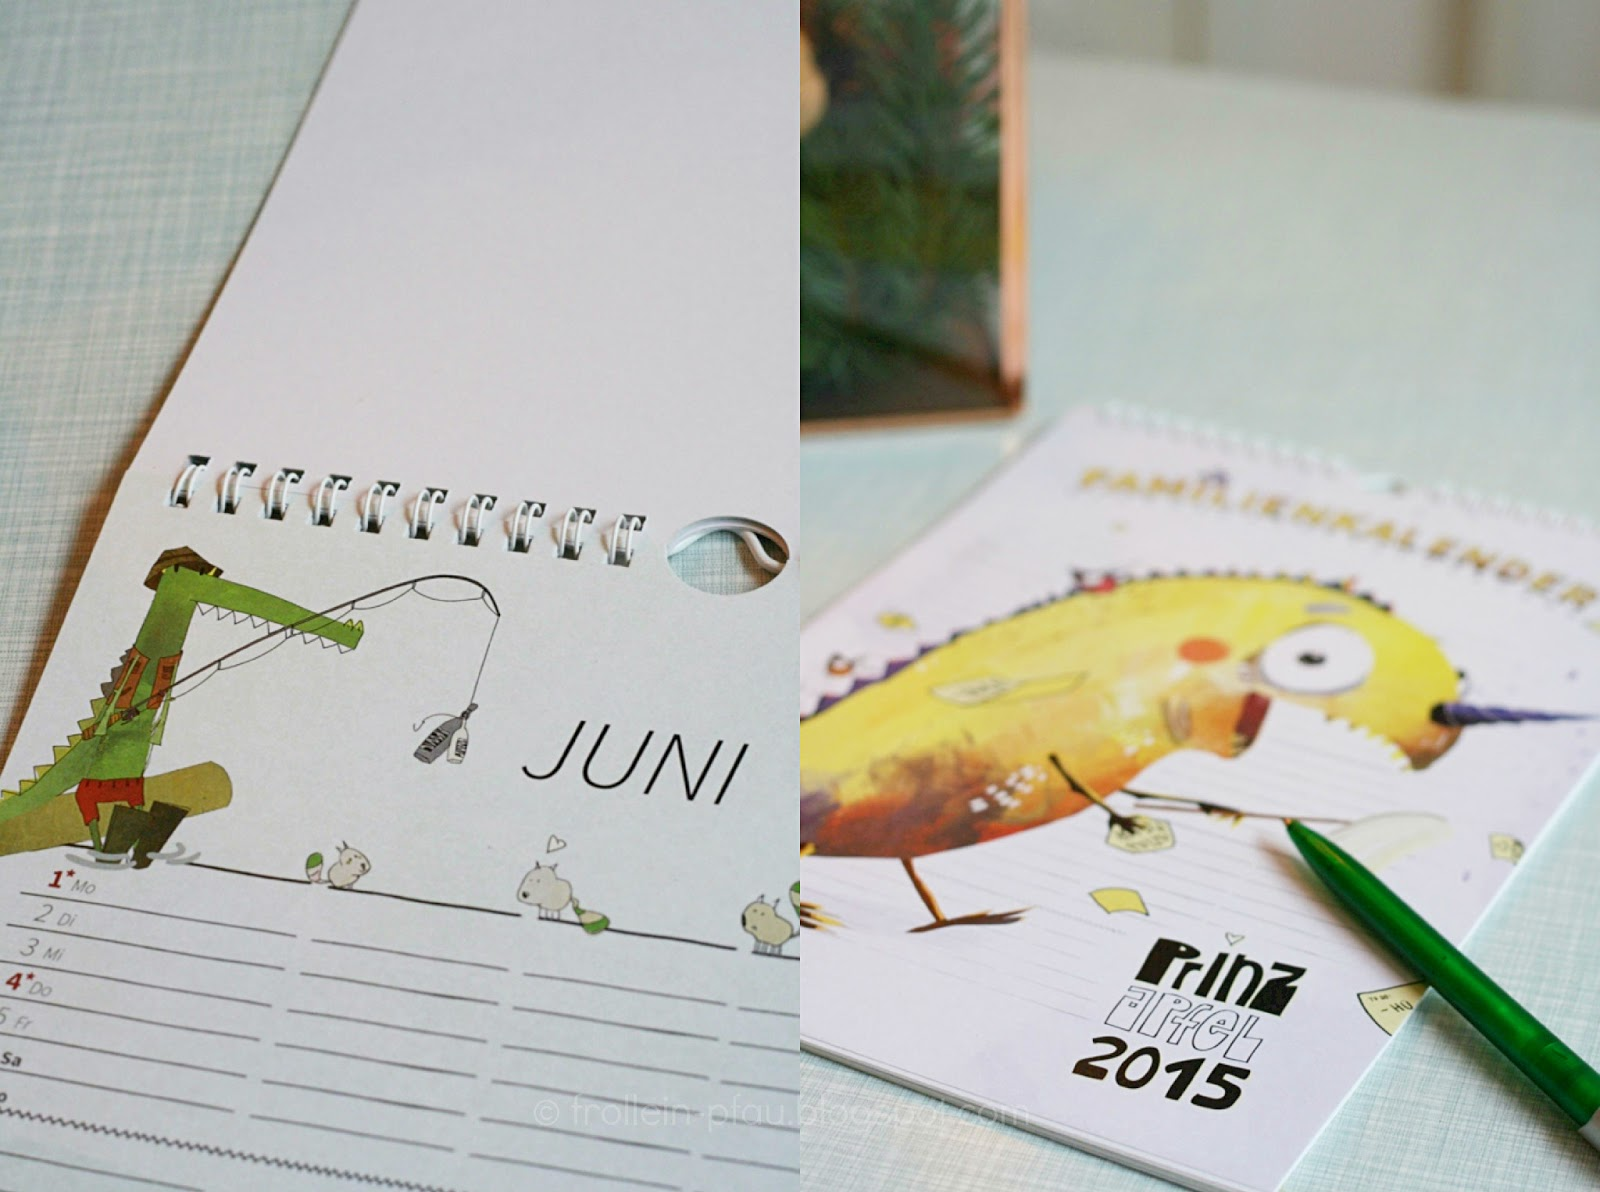 Prinz Apfel, Kalender, Familienkalender, Jahreskalender, 2015, illustriert, Illustrationen, Drache